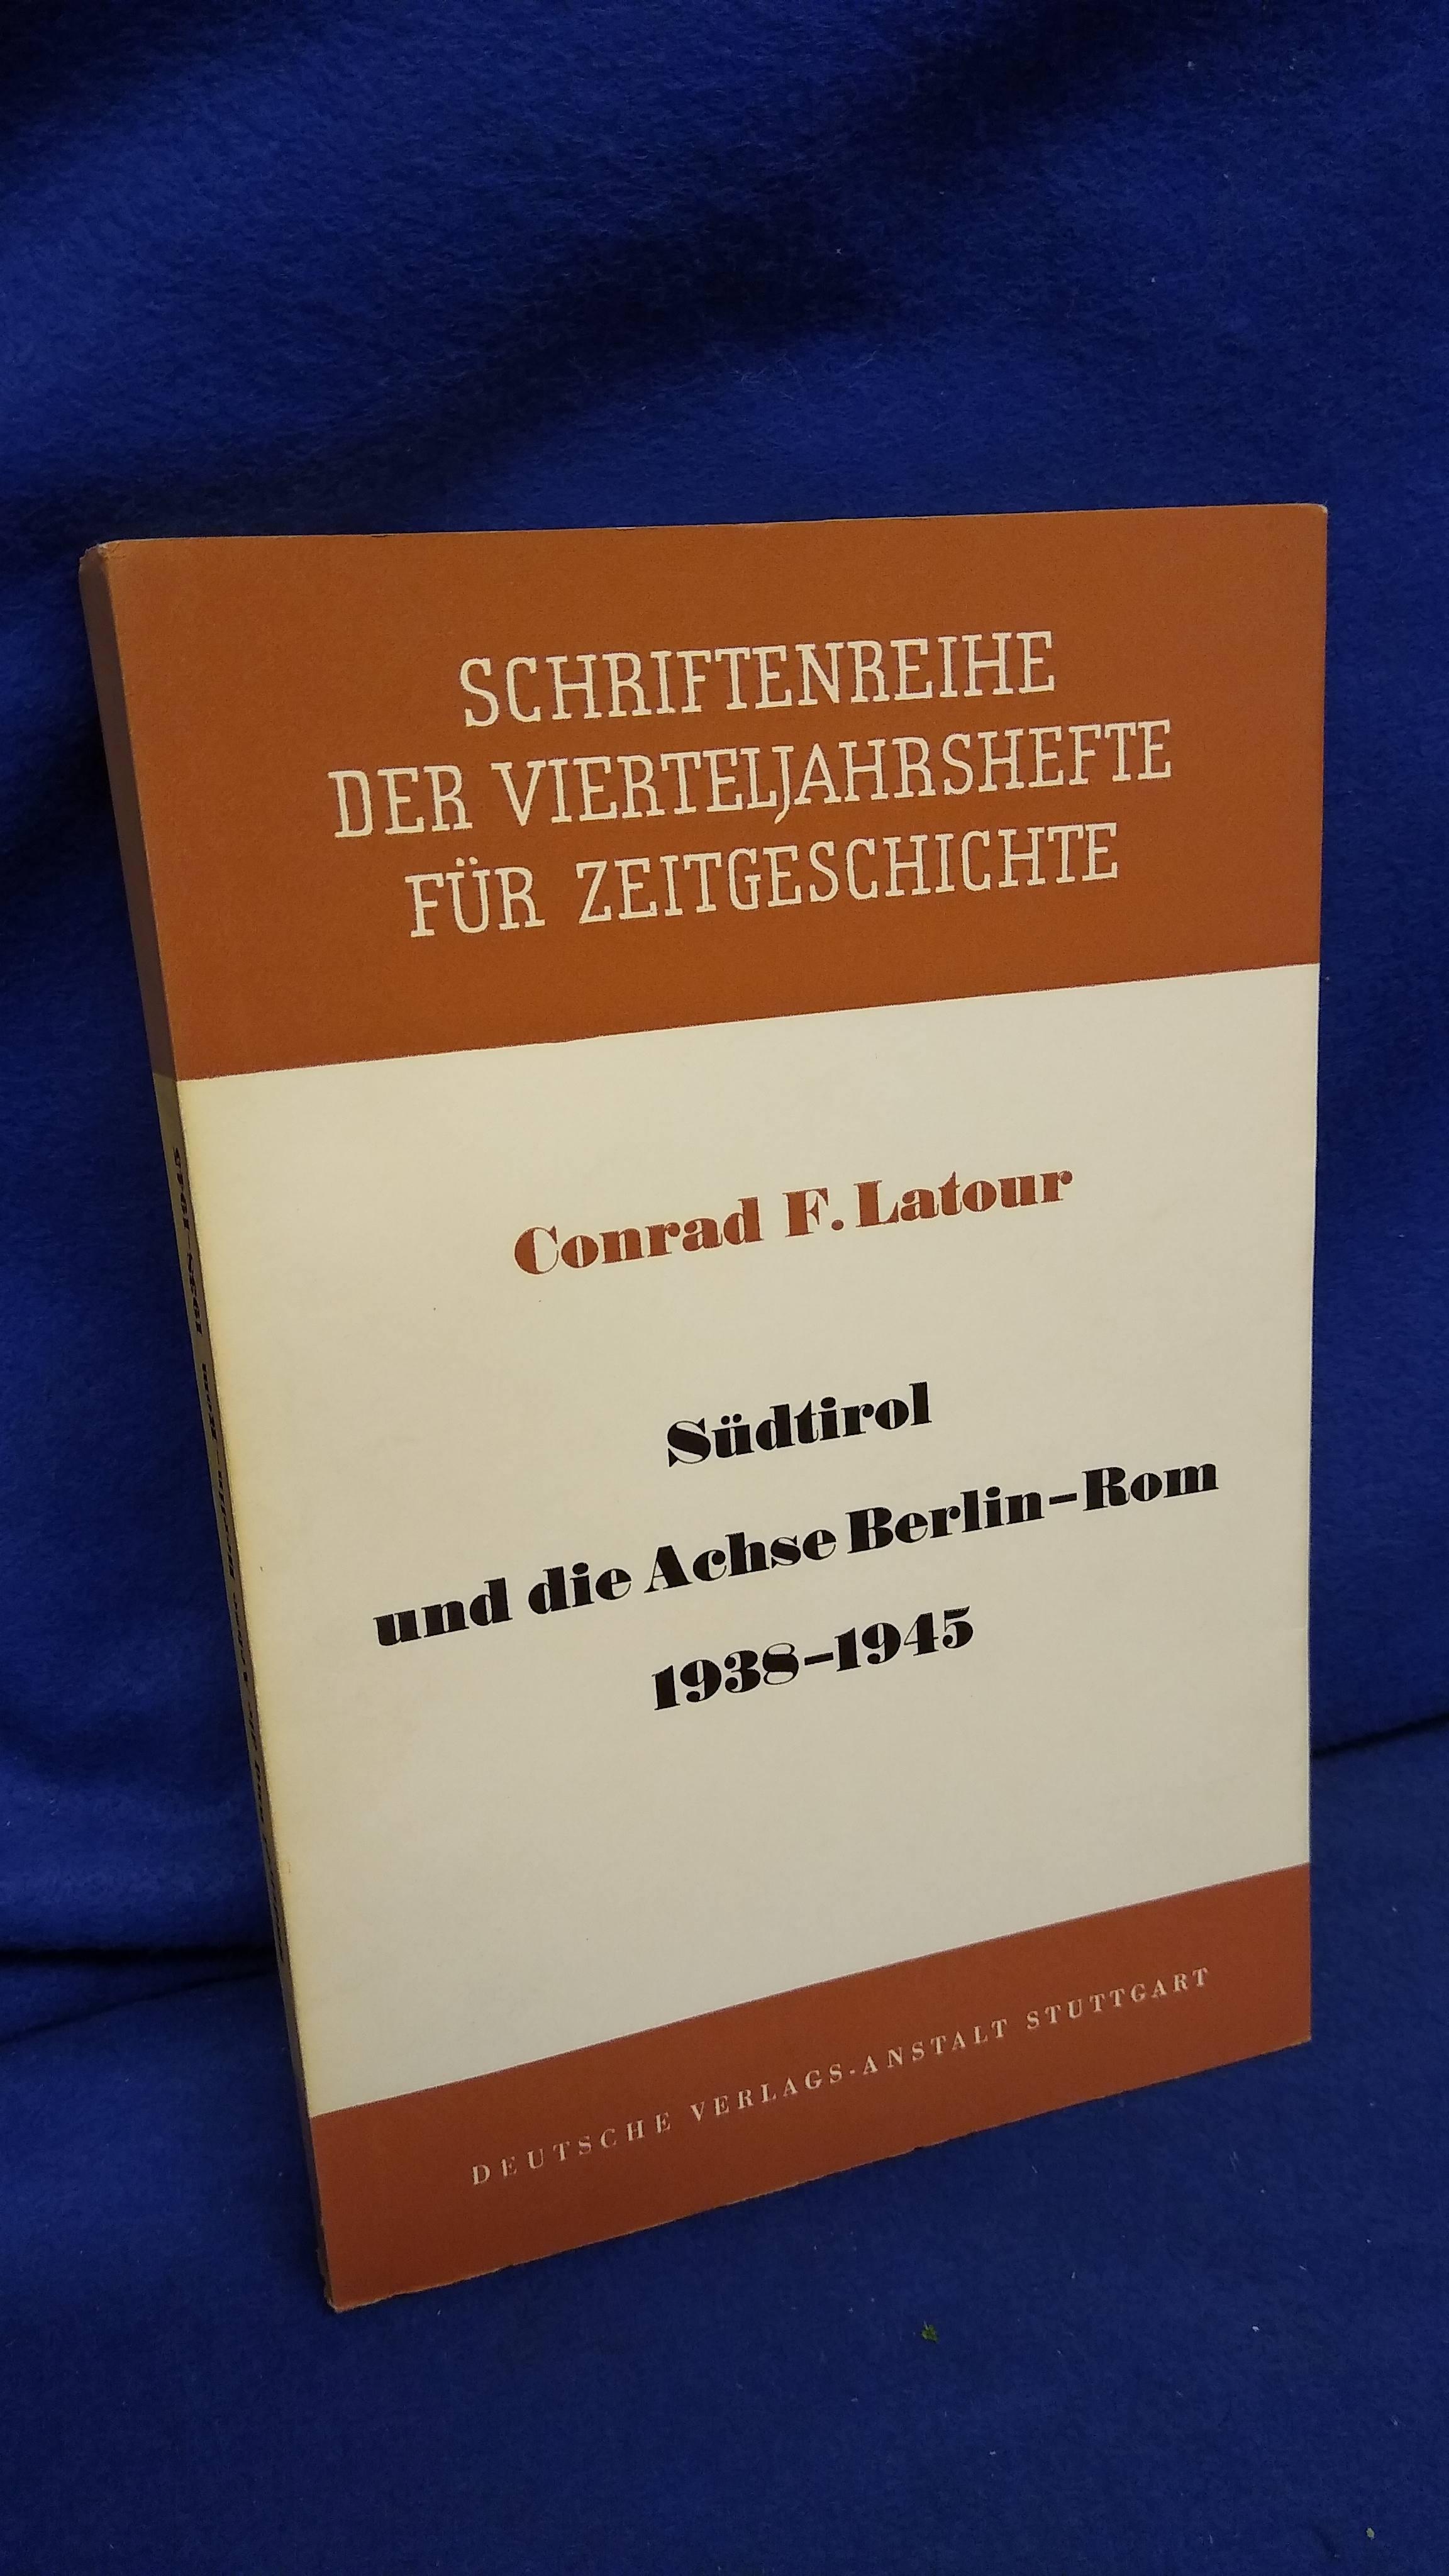 Südtirol und die Achse Berlin-Rom 1938-1945